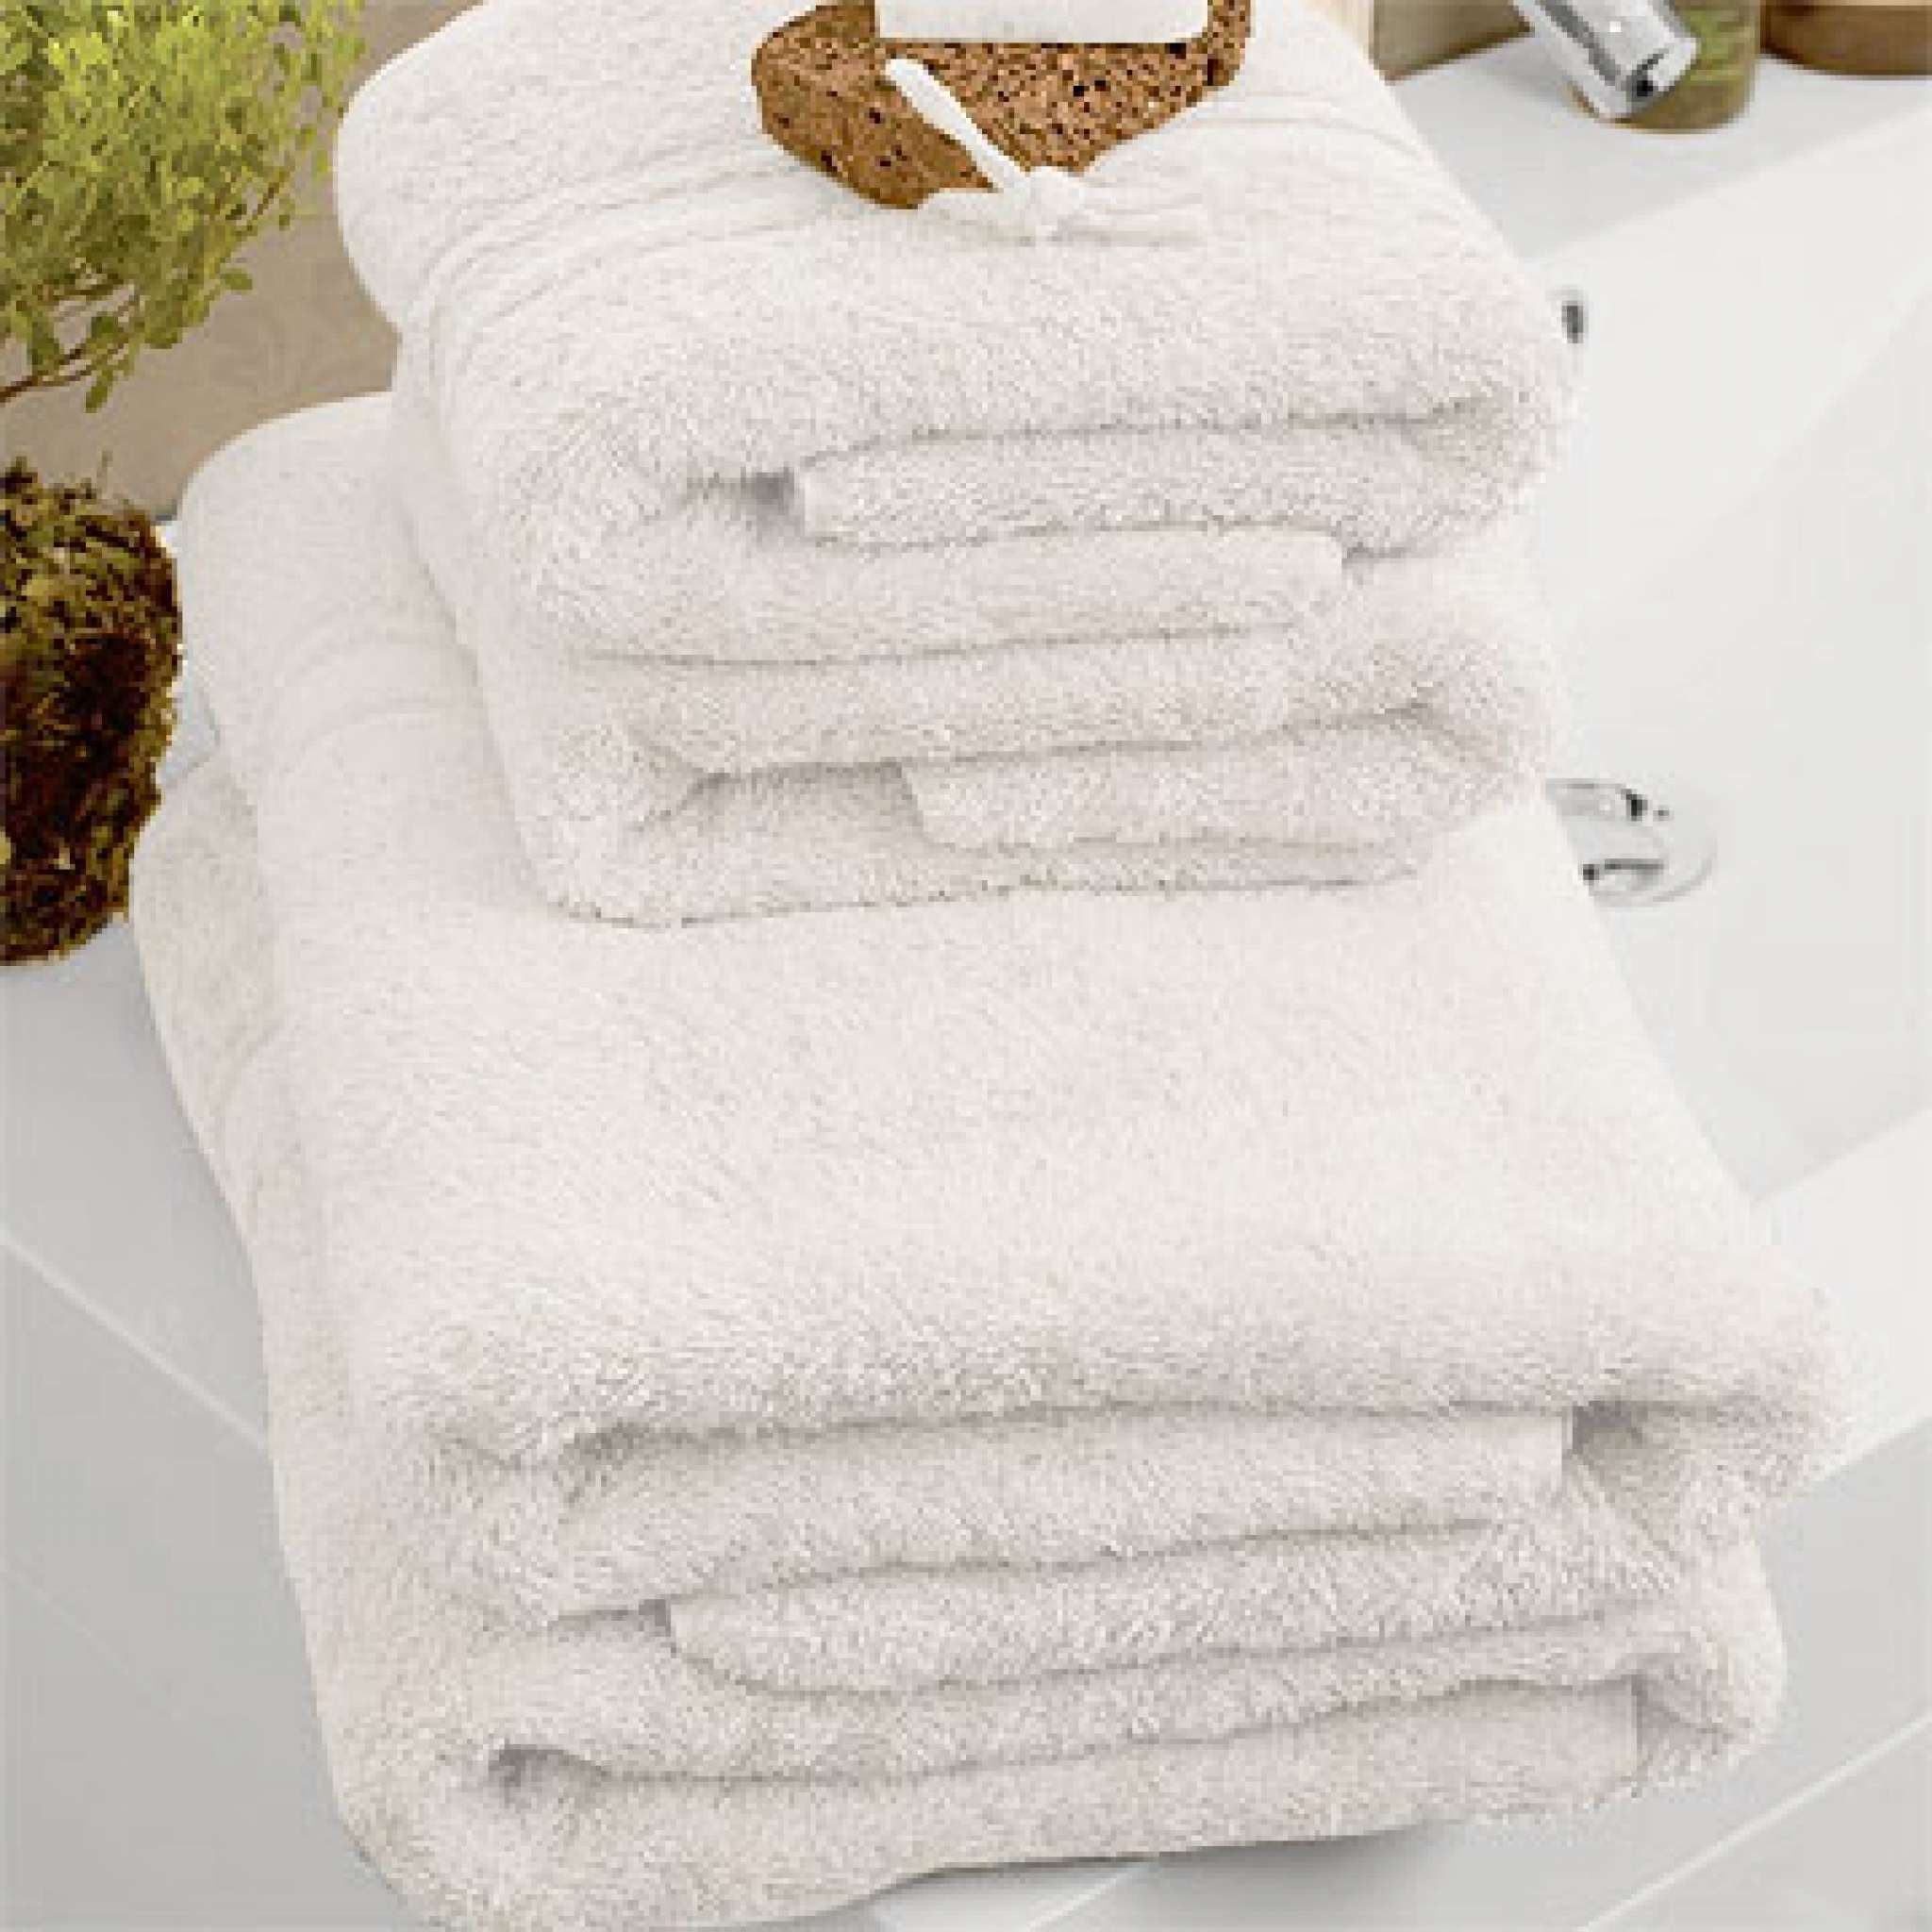 Sparpaket Handtücher, 4-teilig